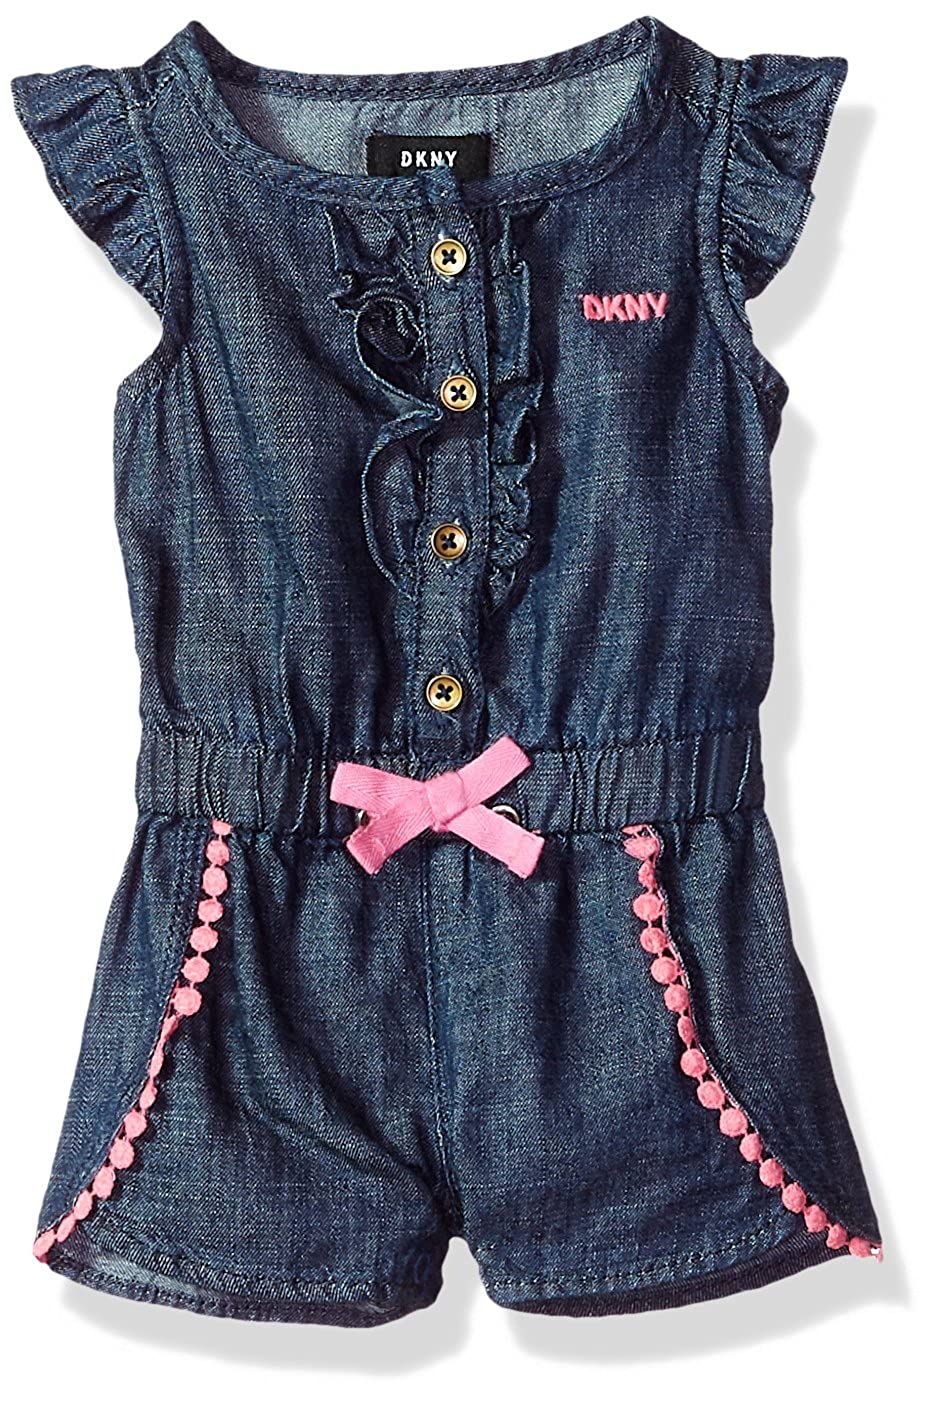 DKNY Baby Girls Romper